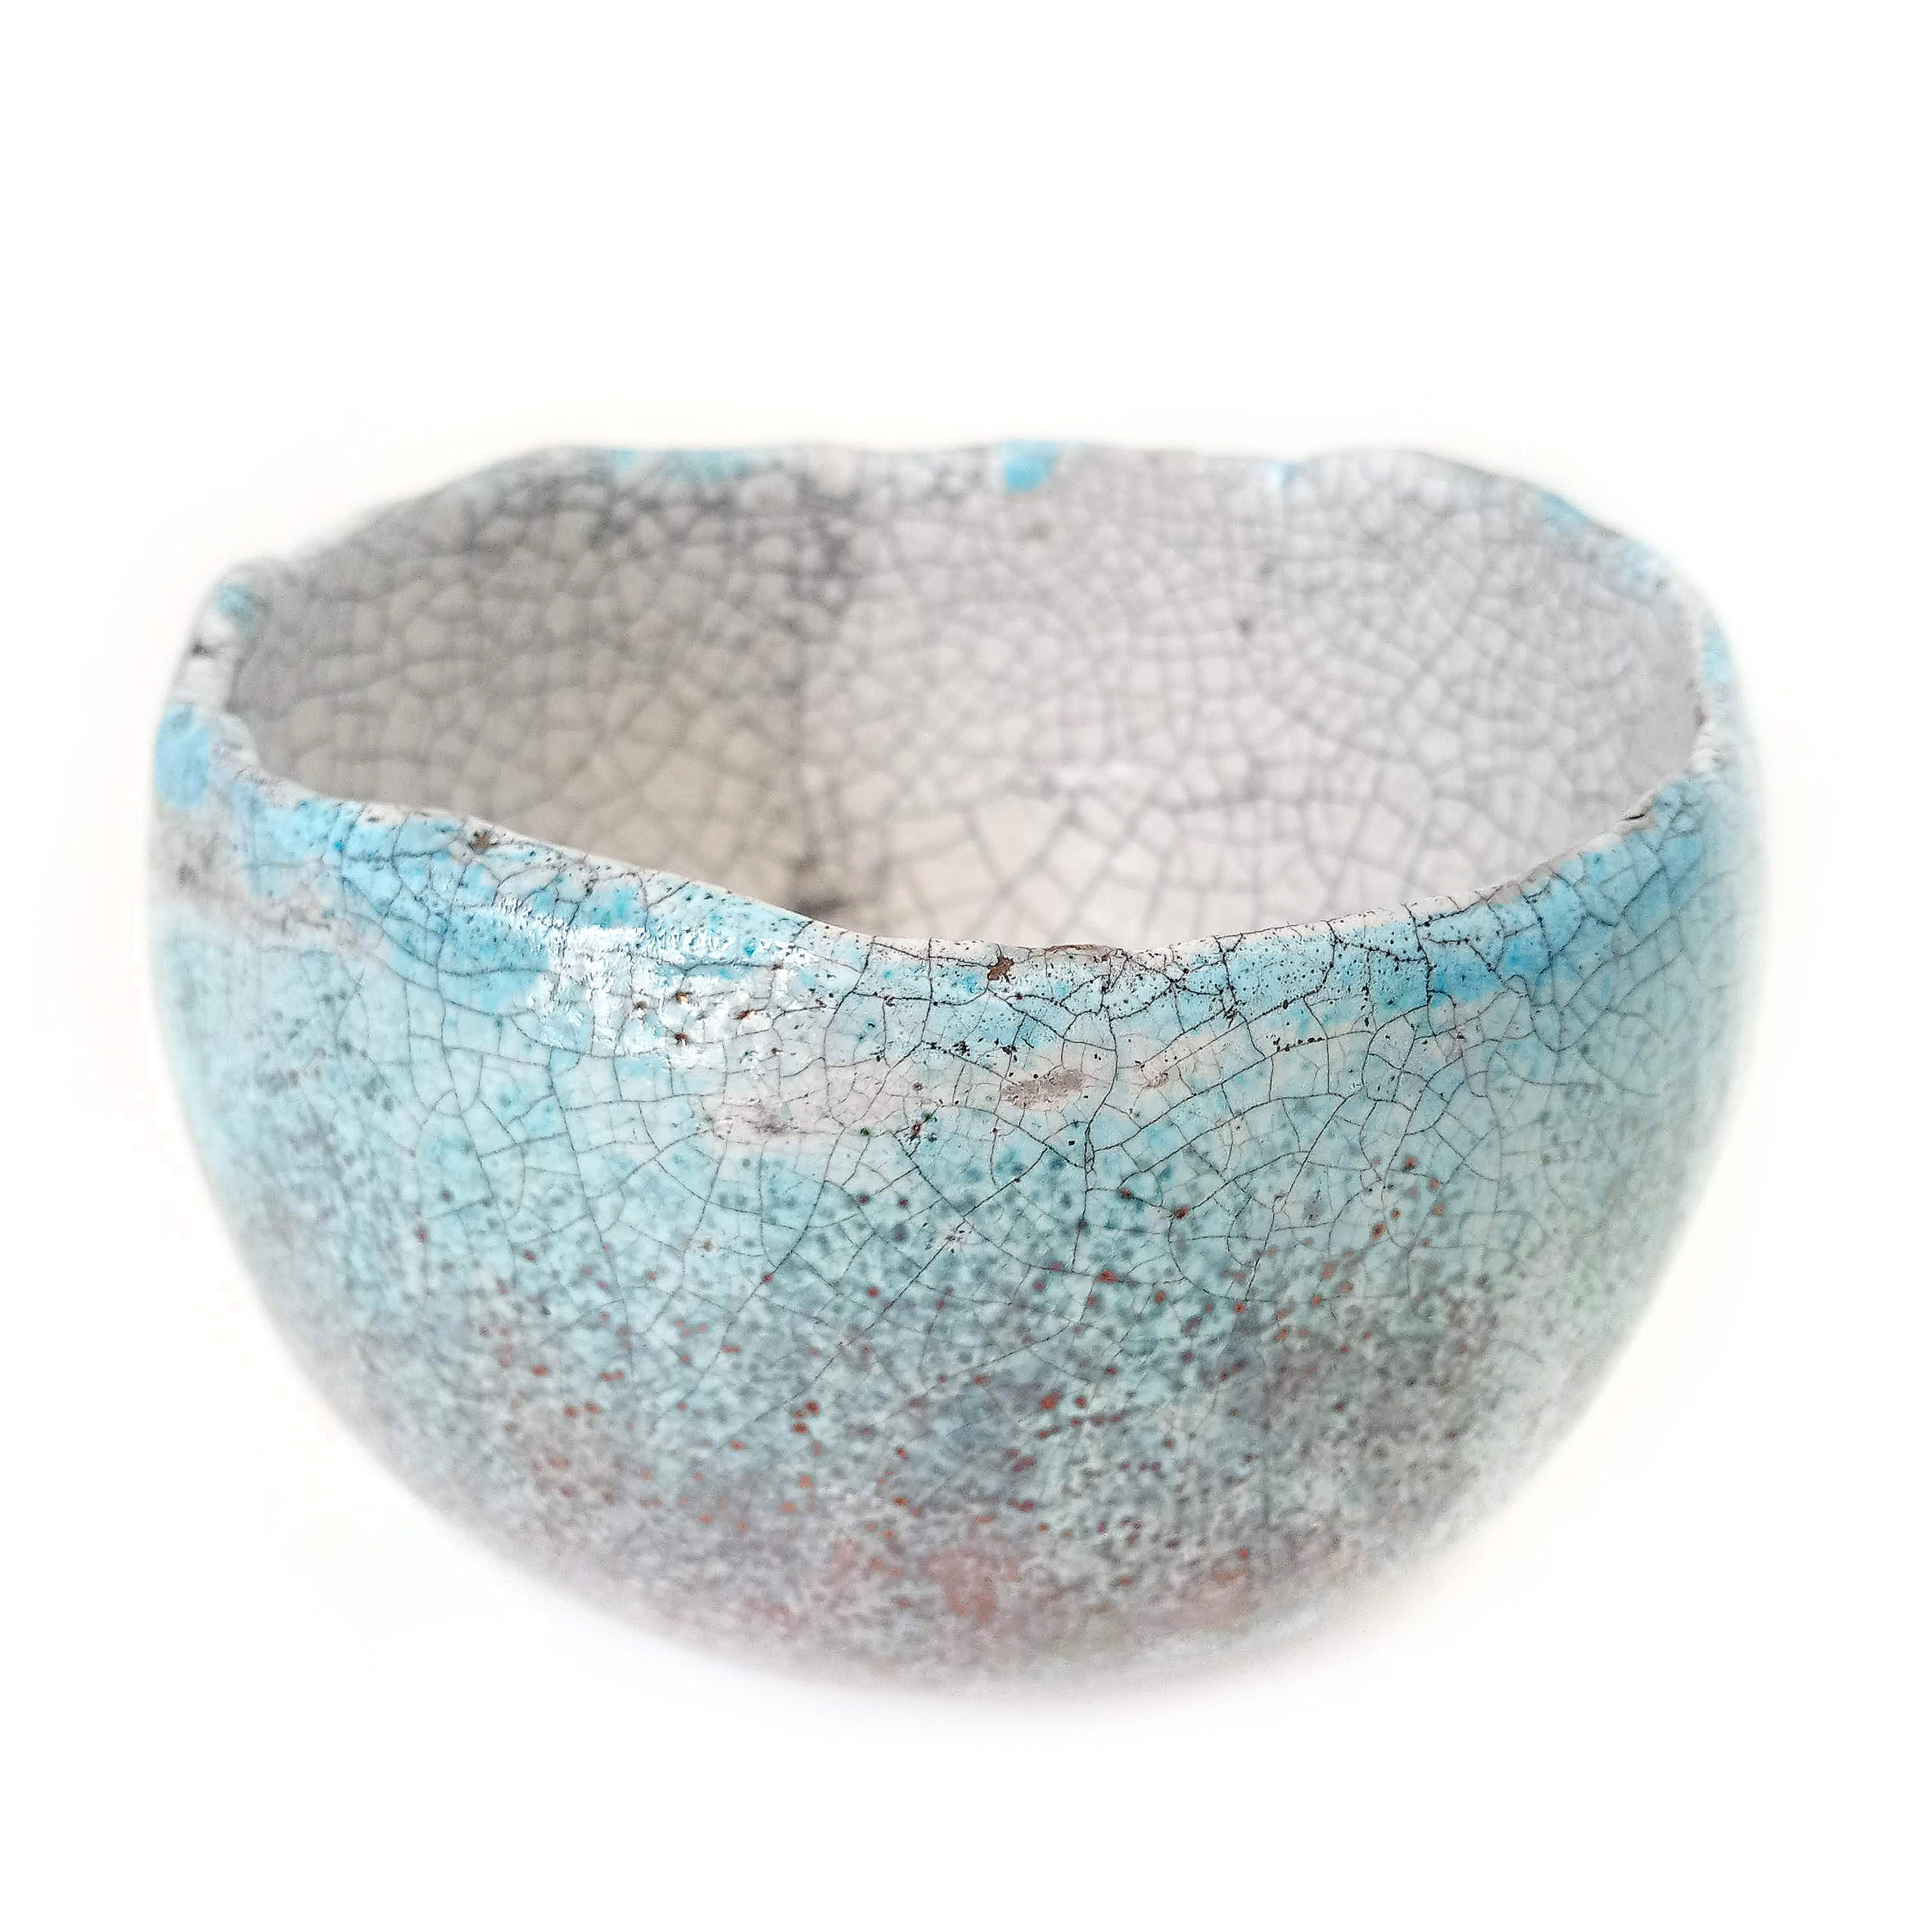 Aqua Raku Bowl, ceramics by Susan Luker